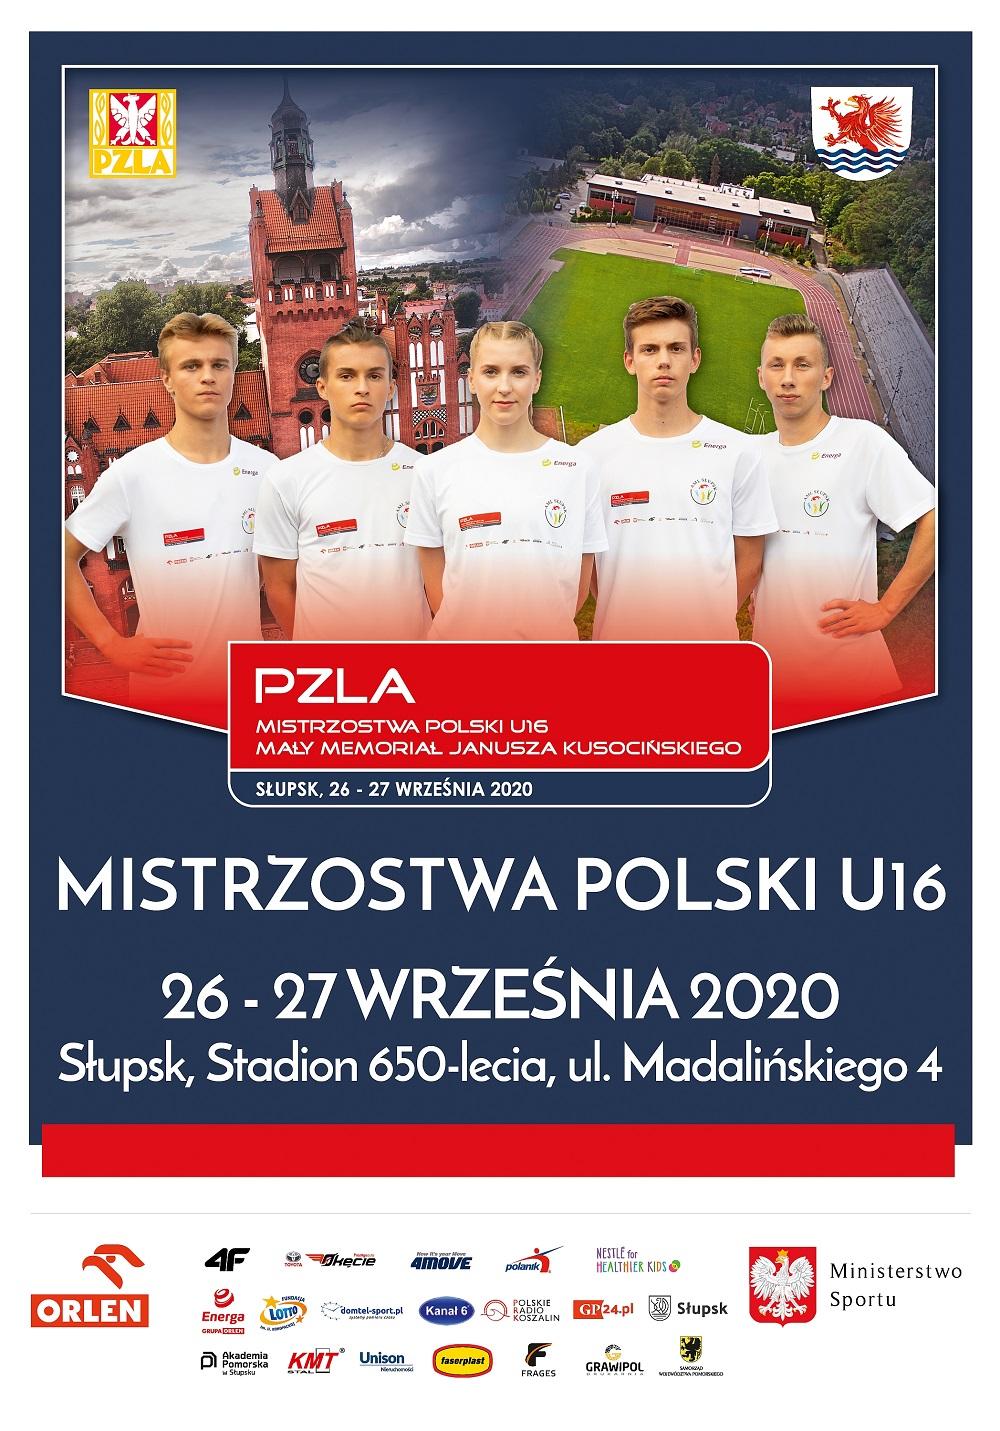 Slupsk2020_1